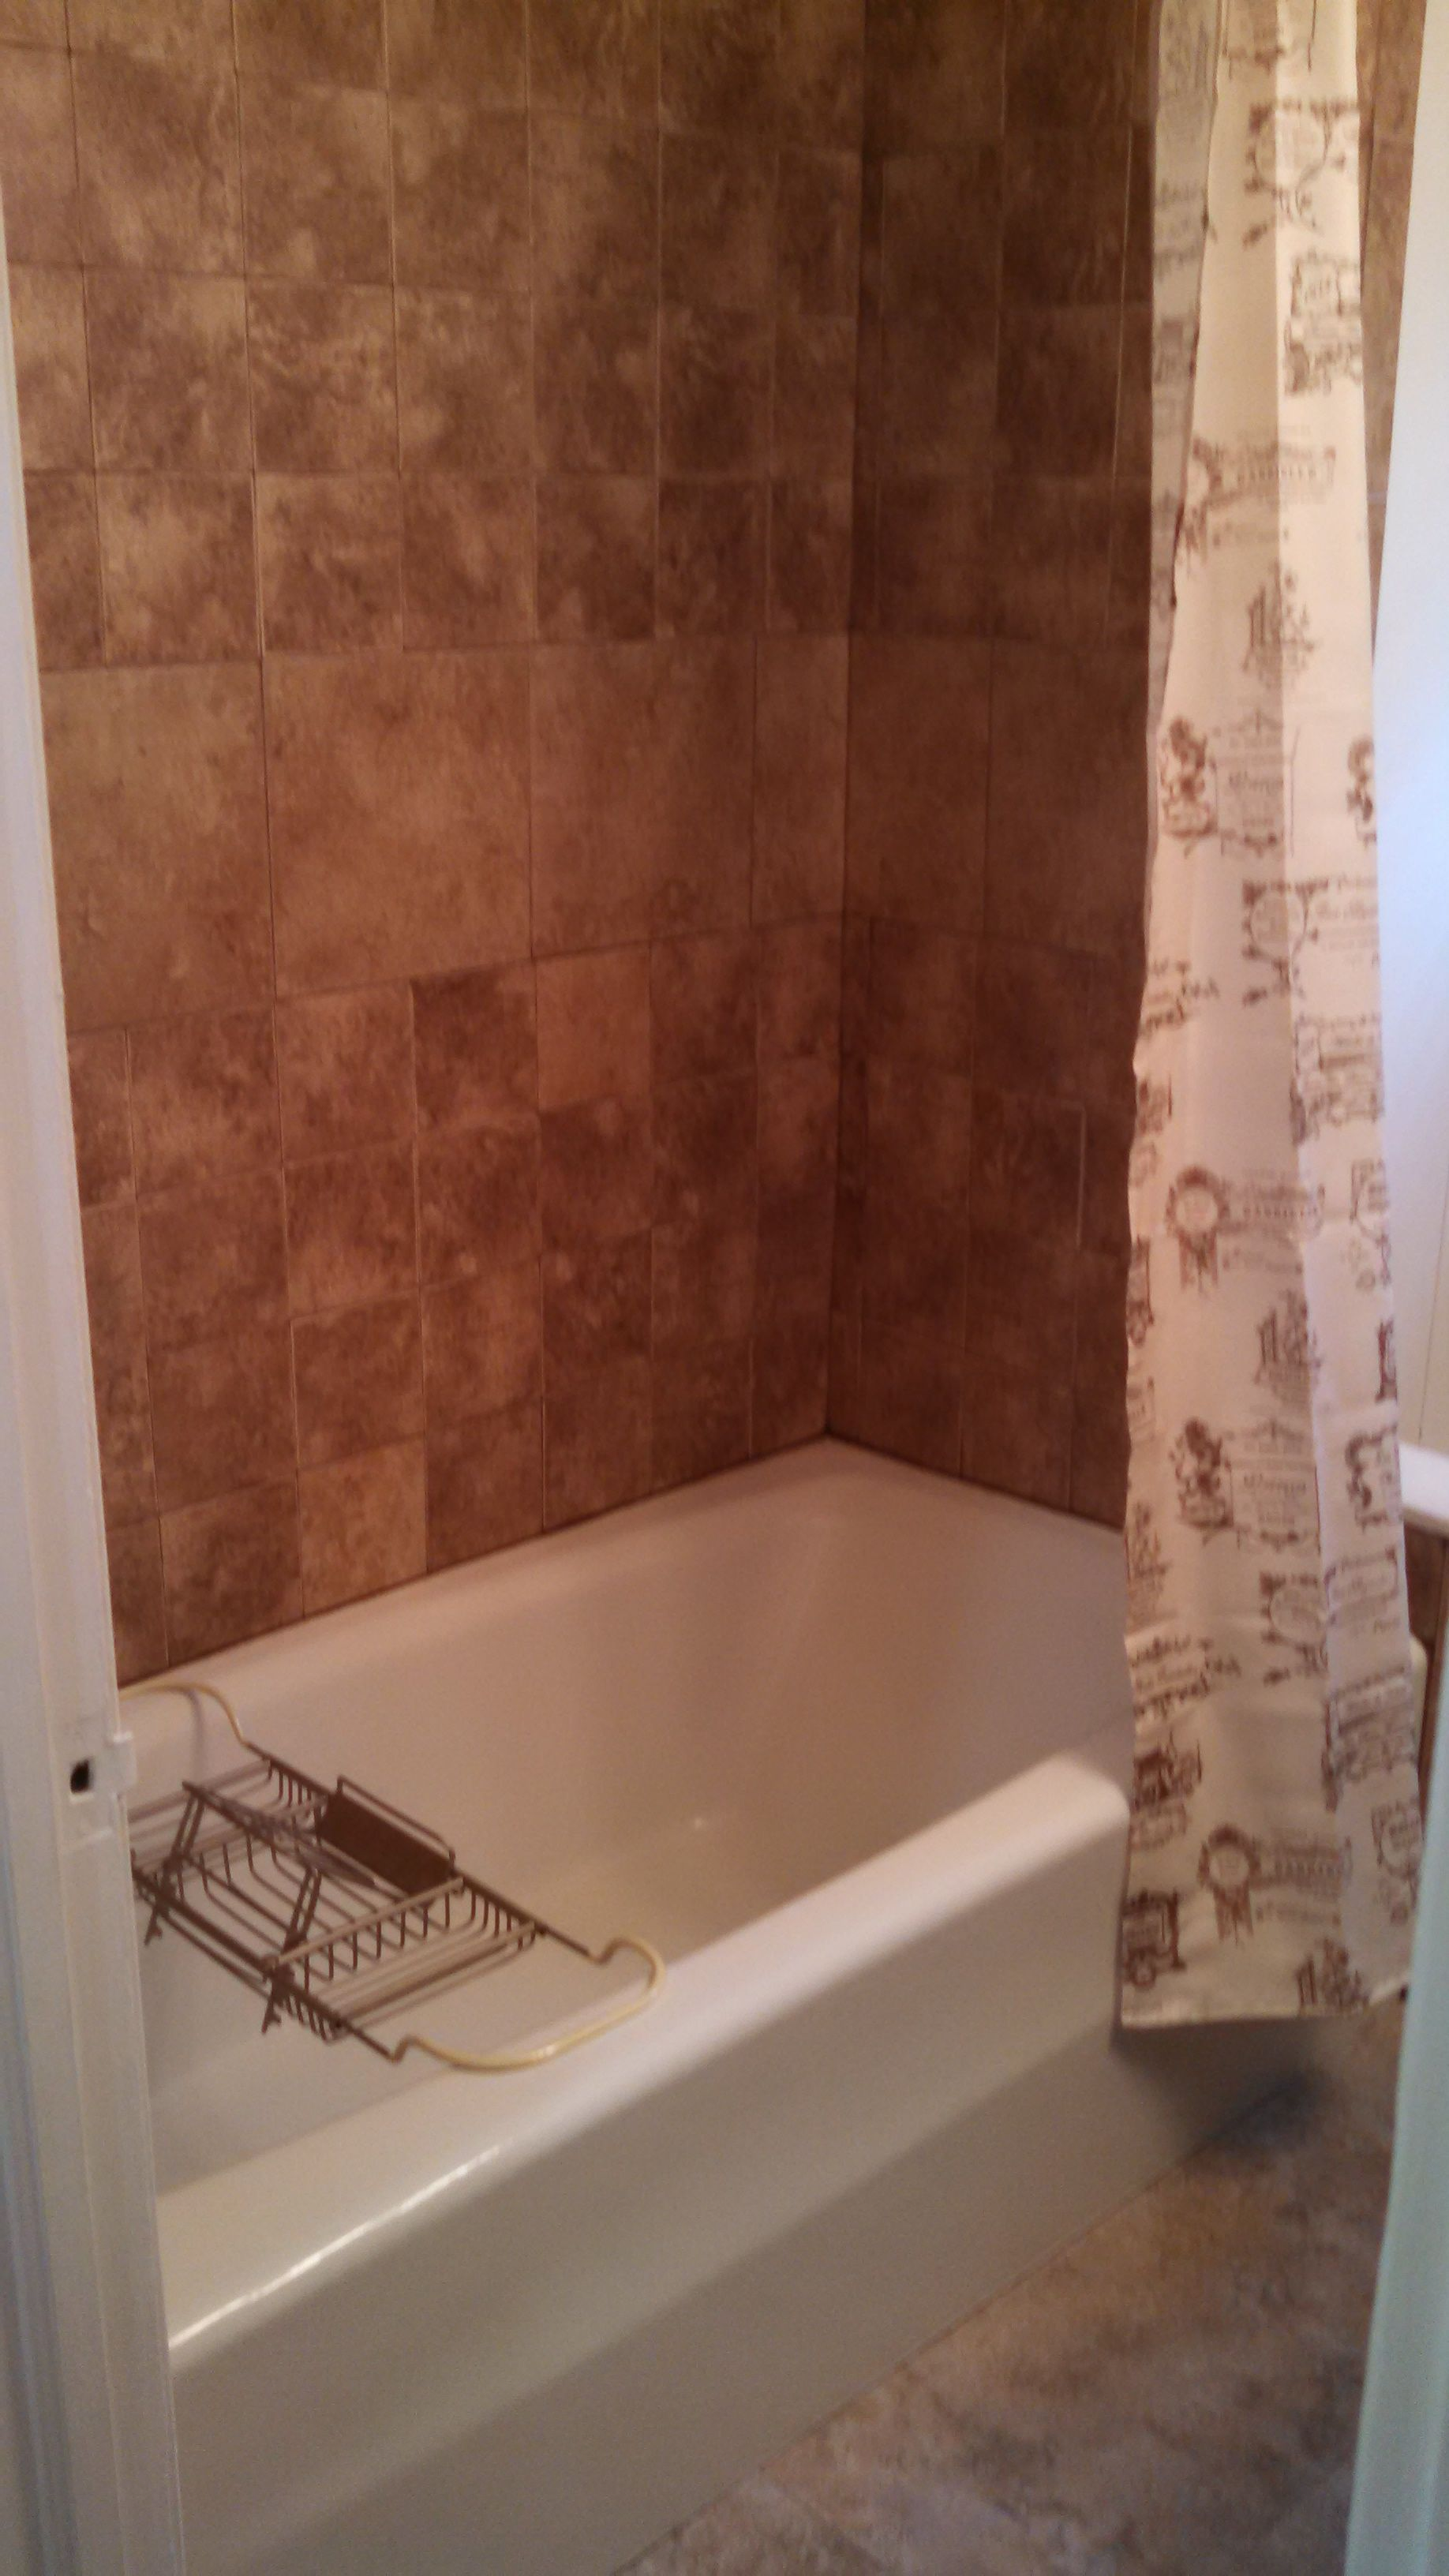 shower stall | vernon project | Pinterest